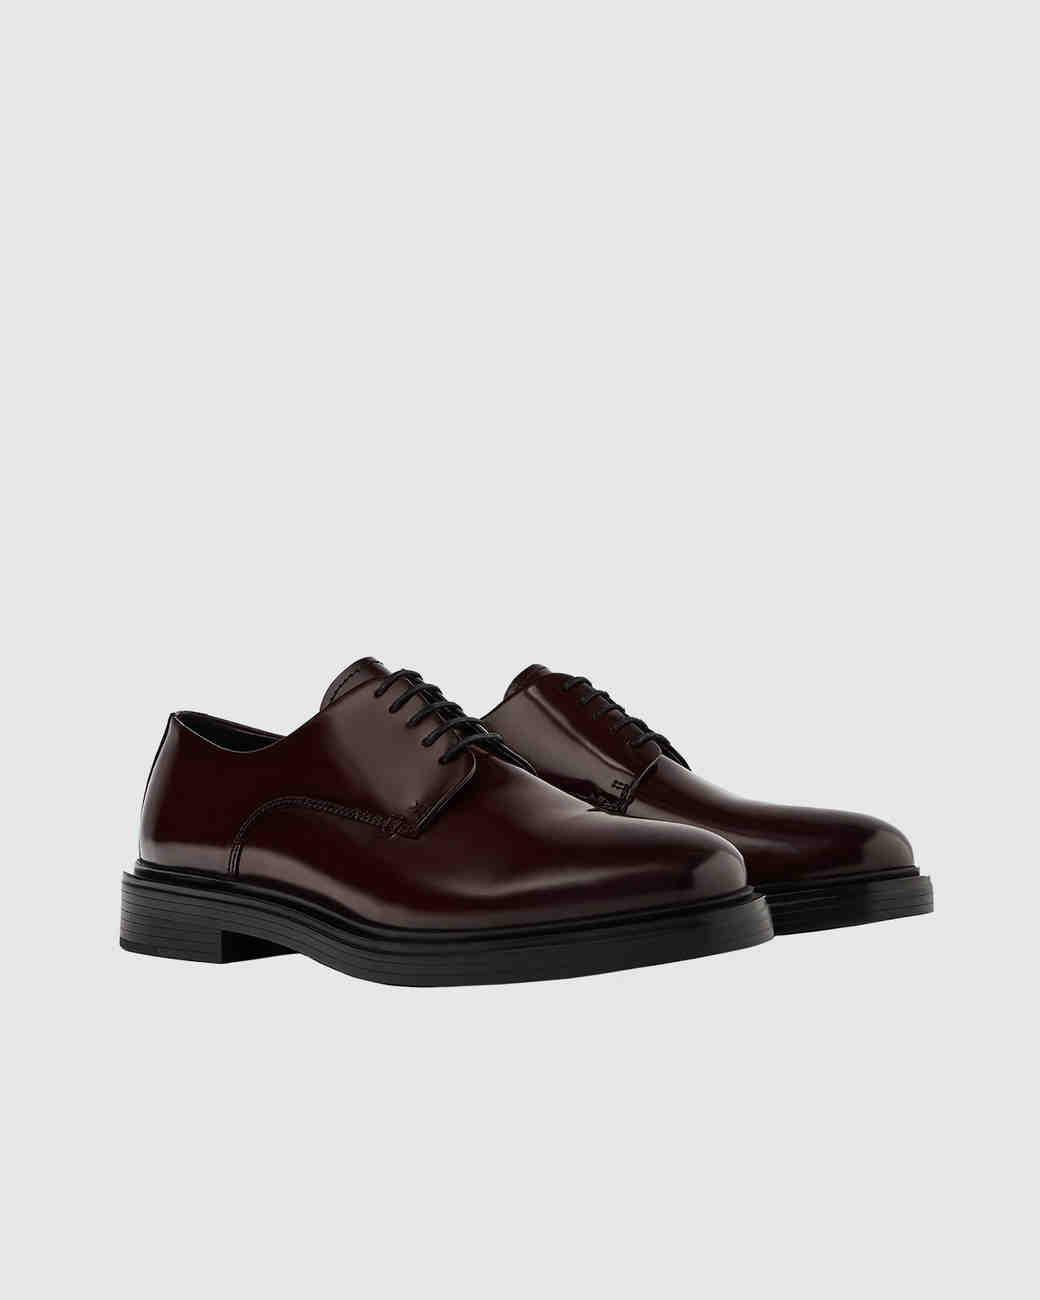 Zara Glossy Finish Leather Shoes